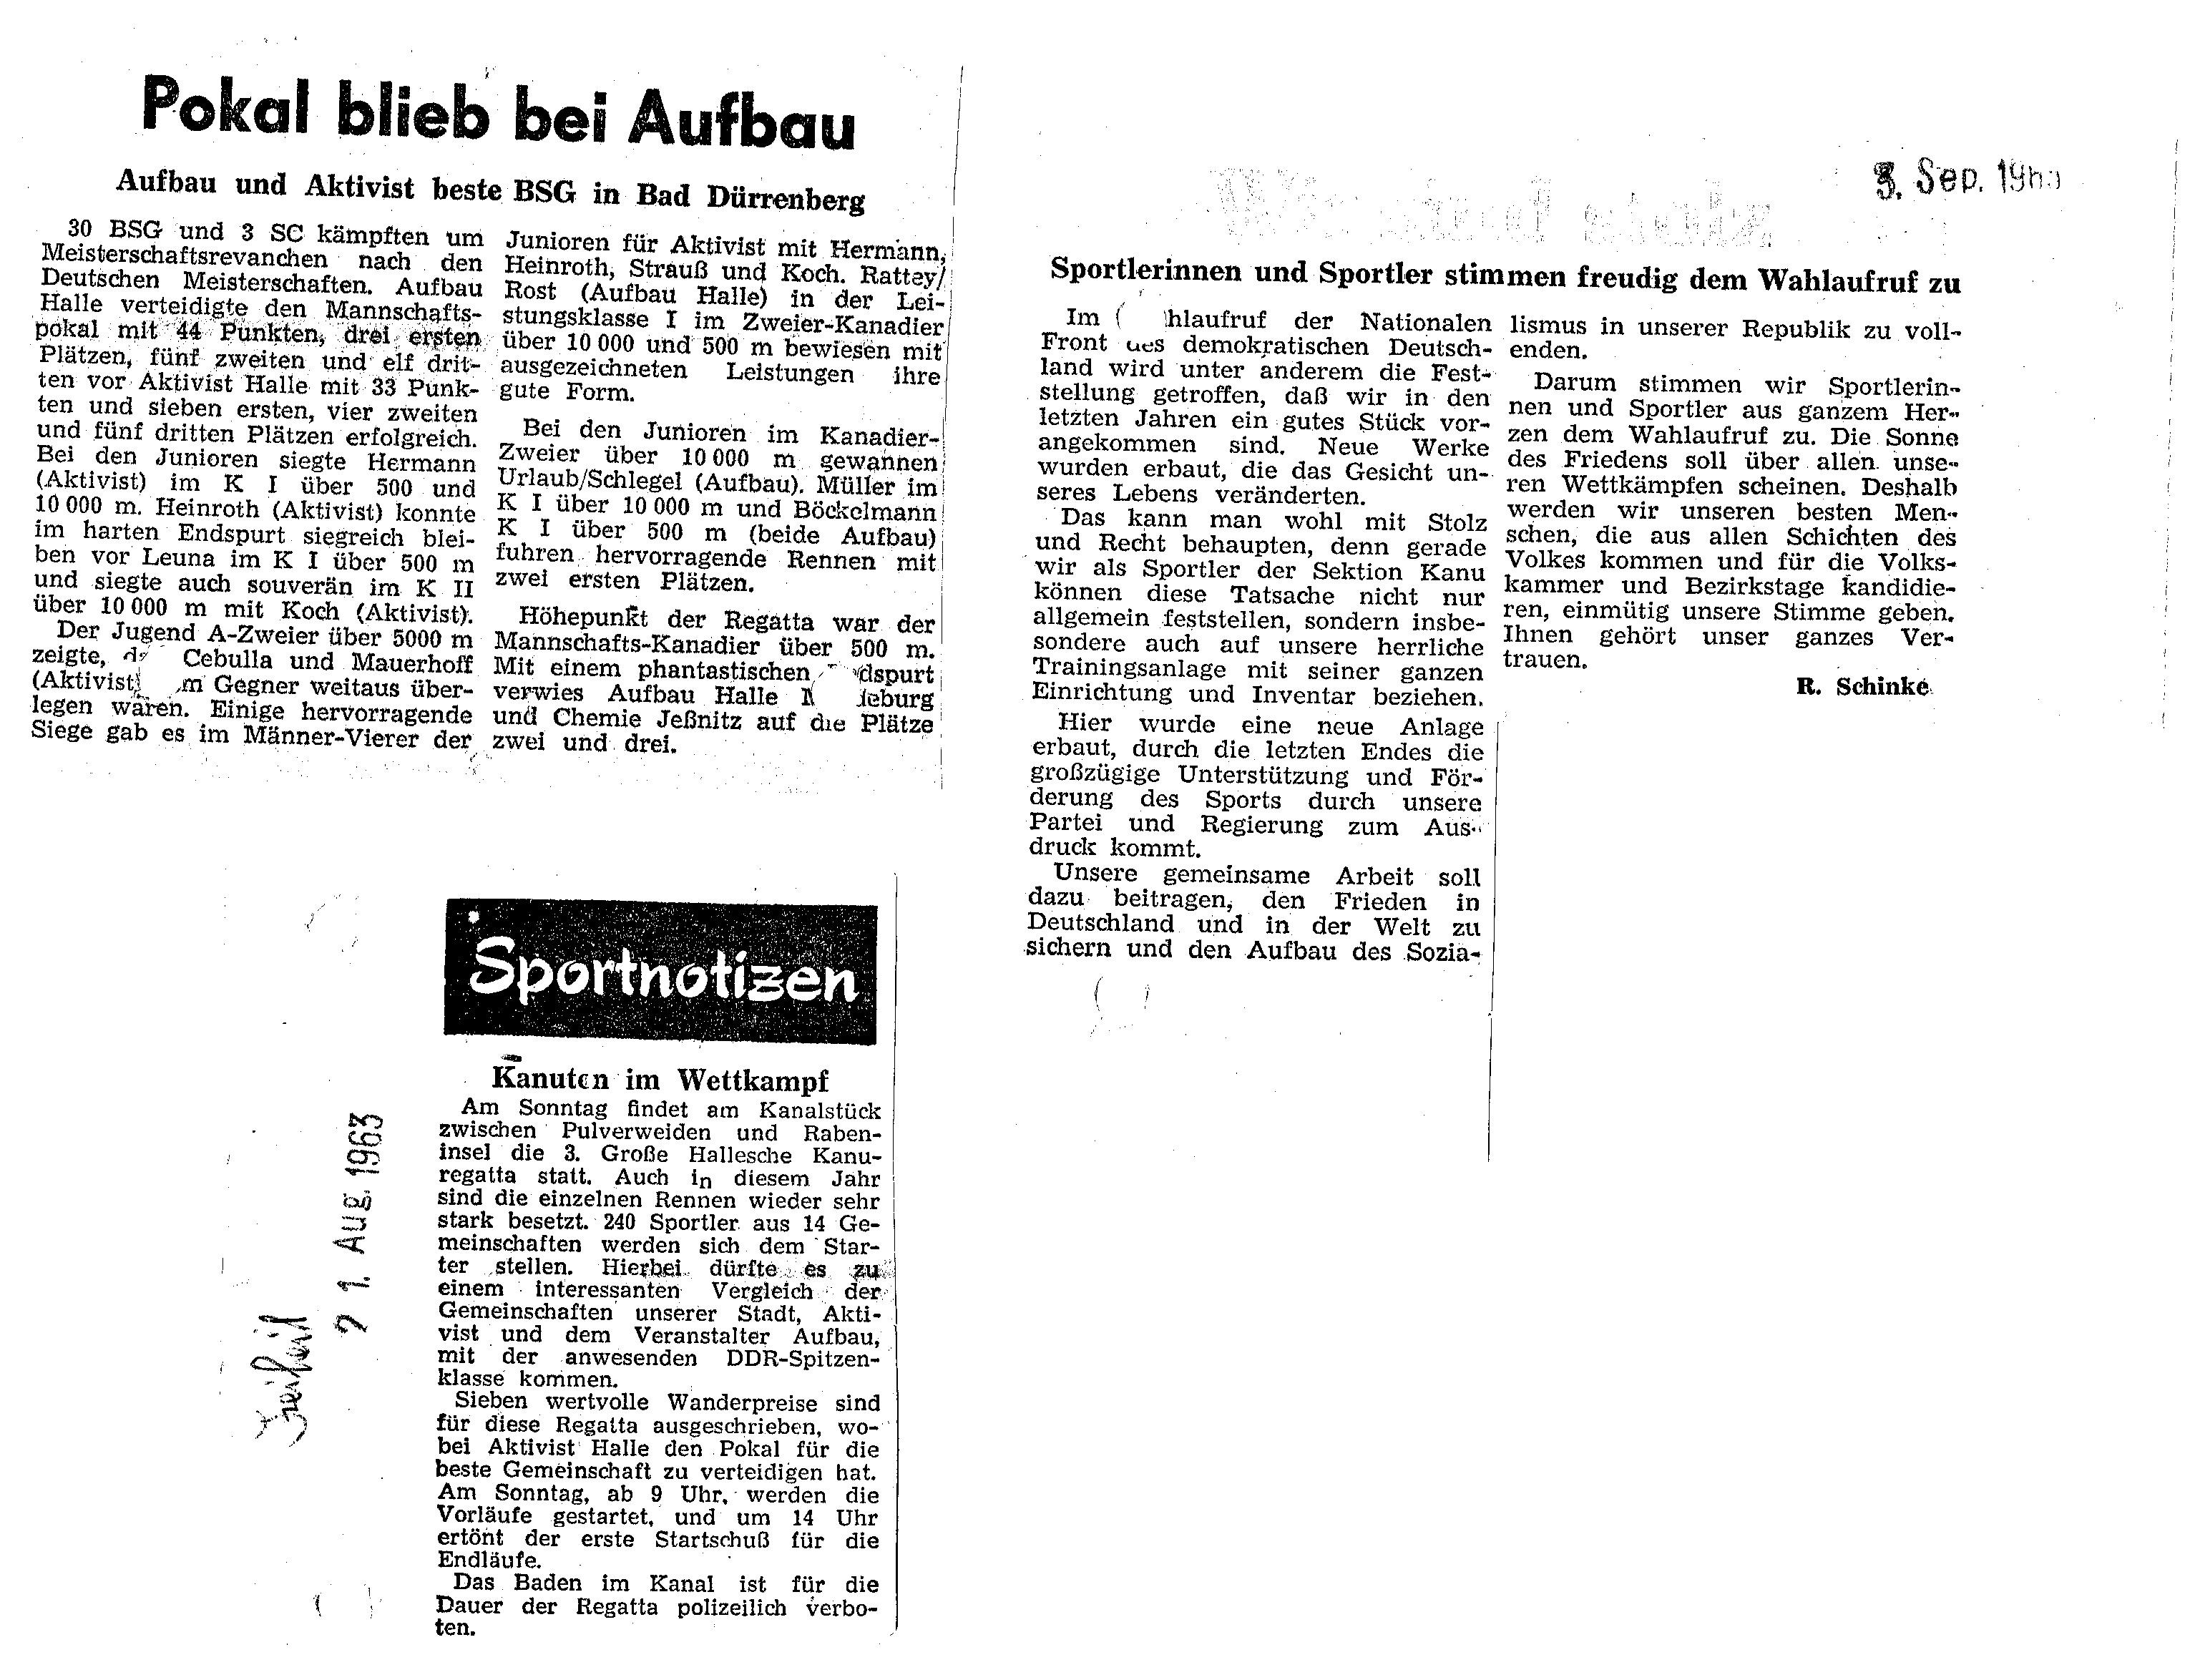 1963-08-21 Polaö blieb bei Aufbau